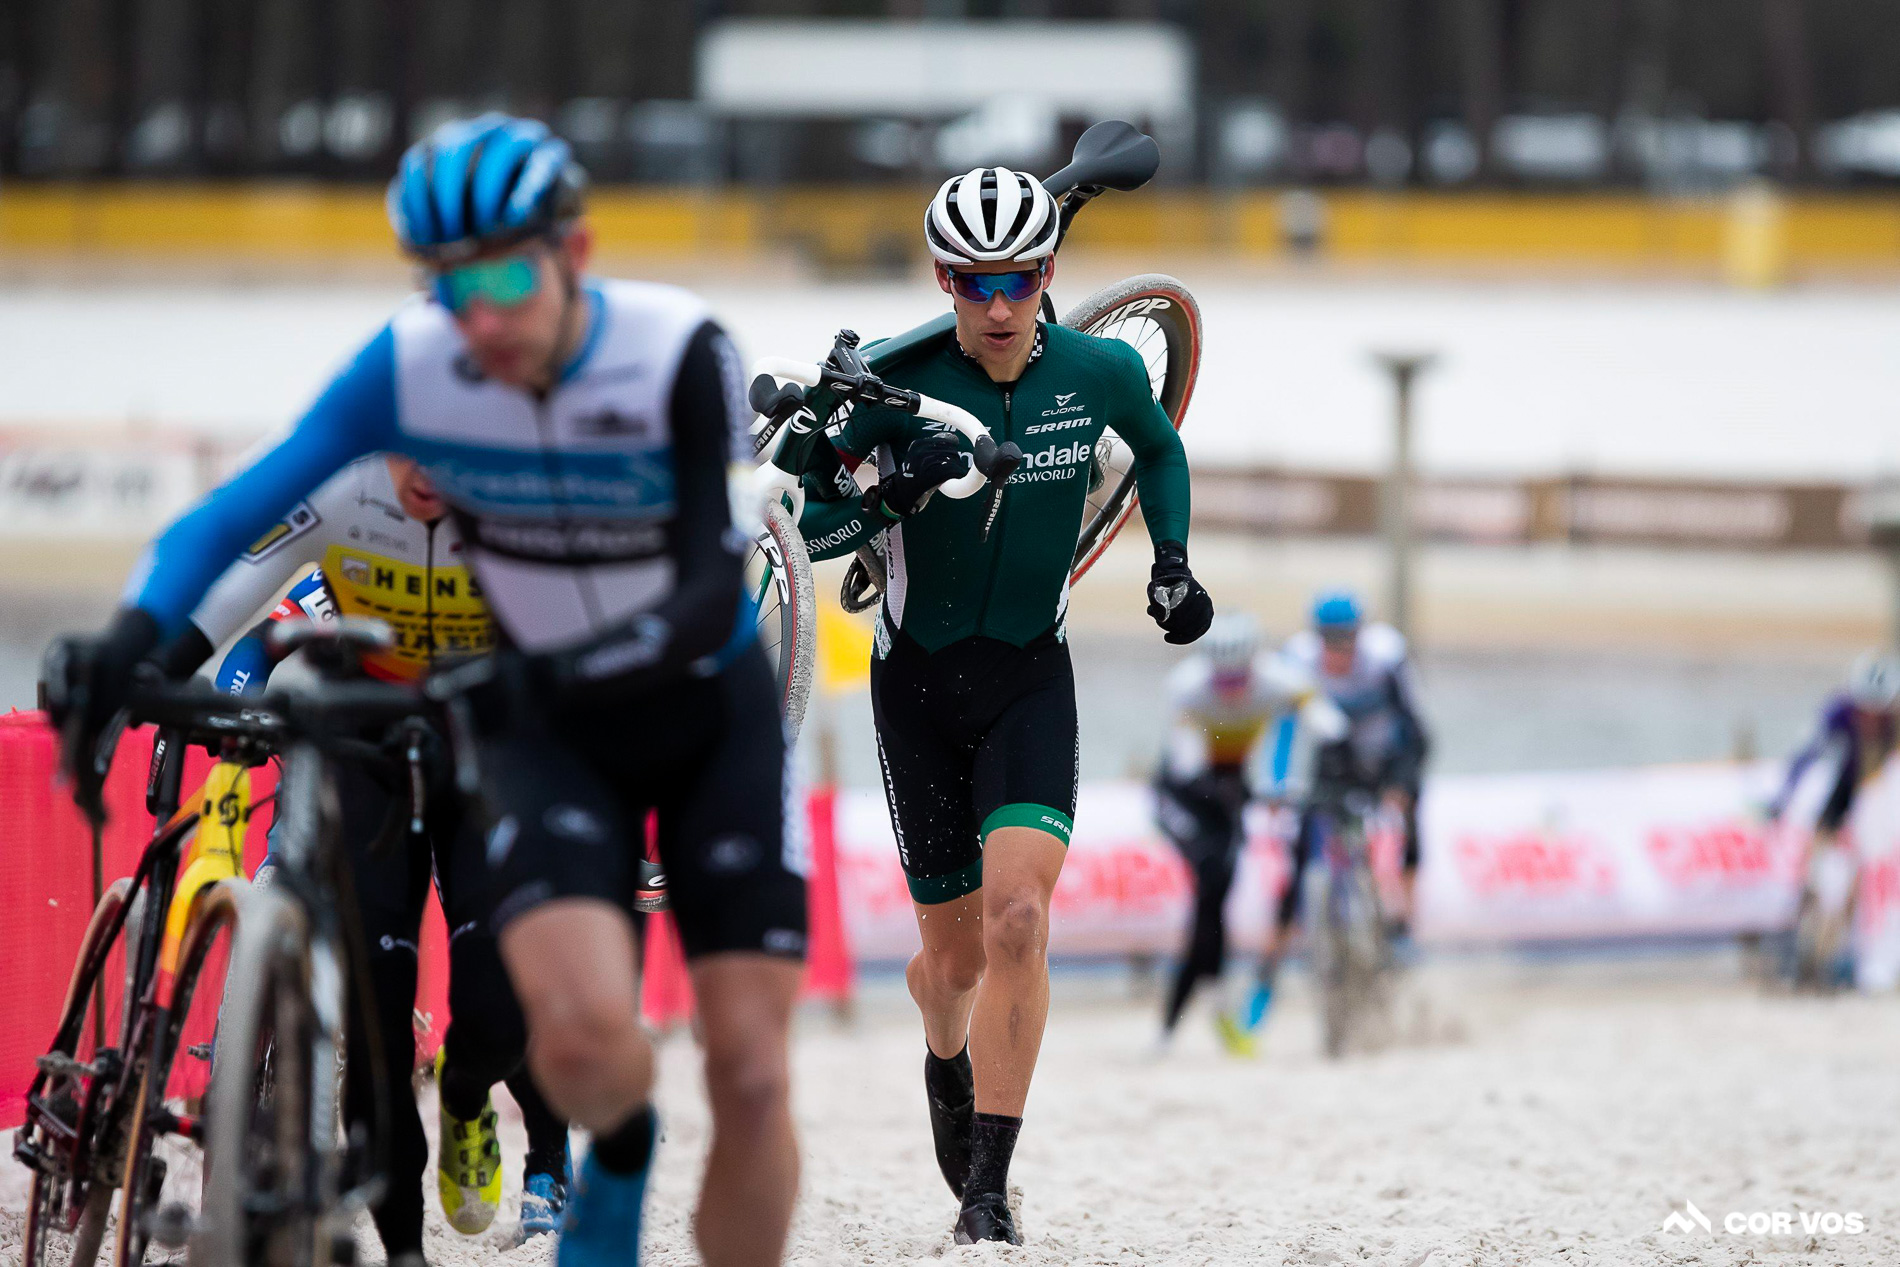 Cyclocross Diaries: Get Comfortable Being Uncomfortable